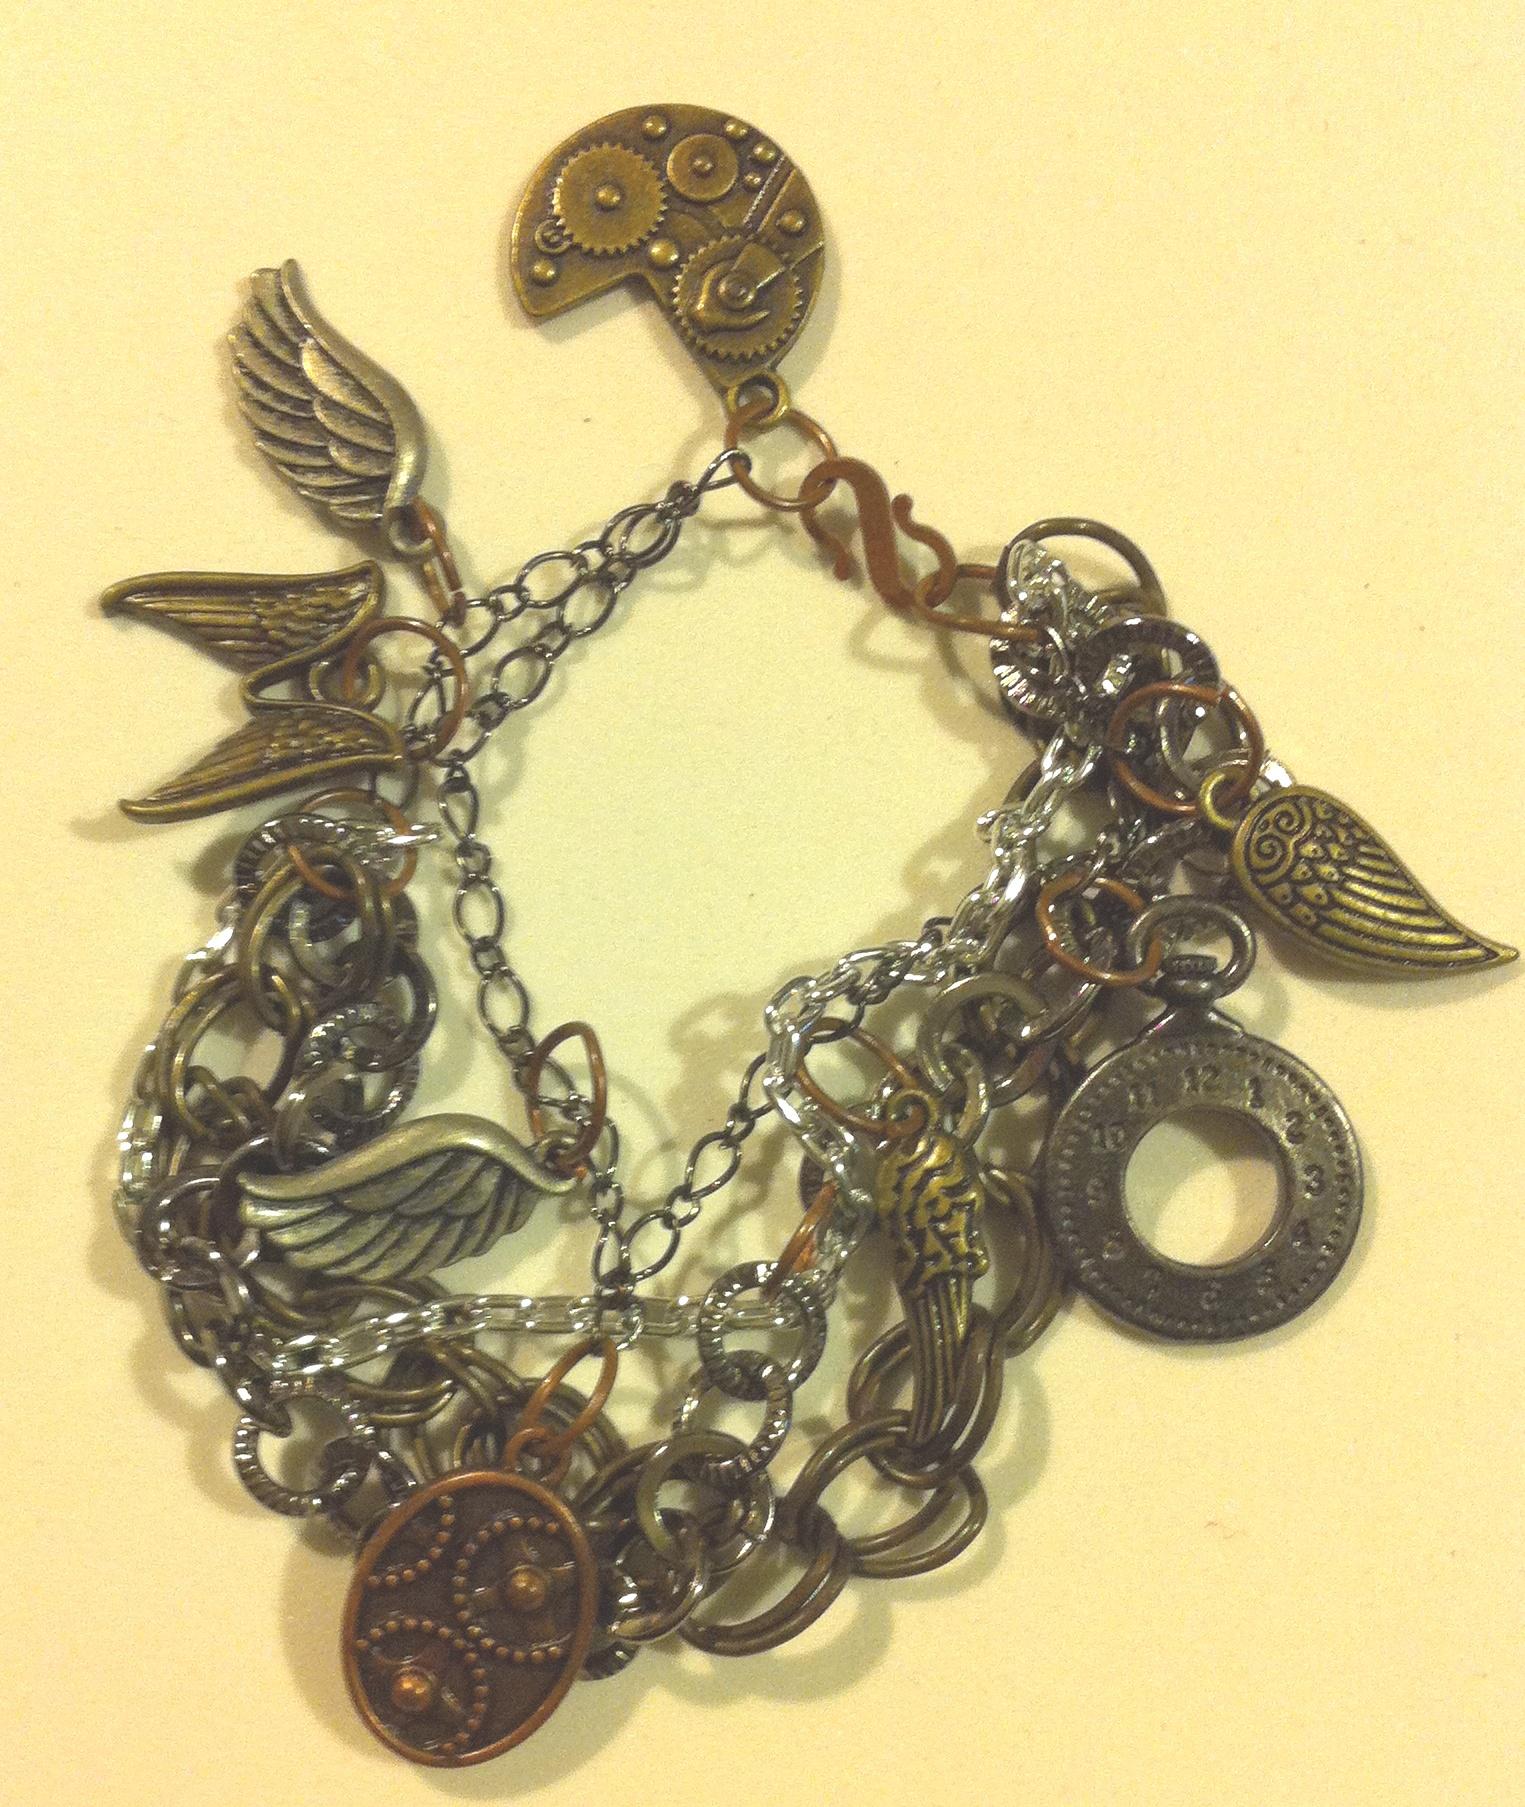 multi_chain_found_objects_bracelet_bracelets_and_wristbands_2.JPG